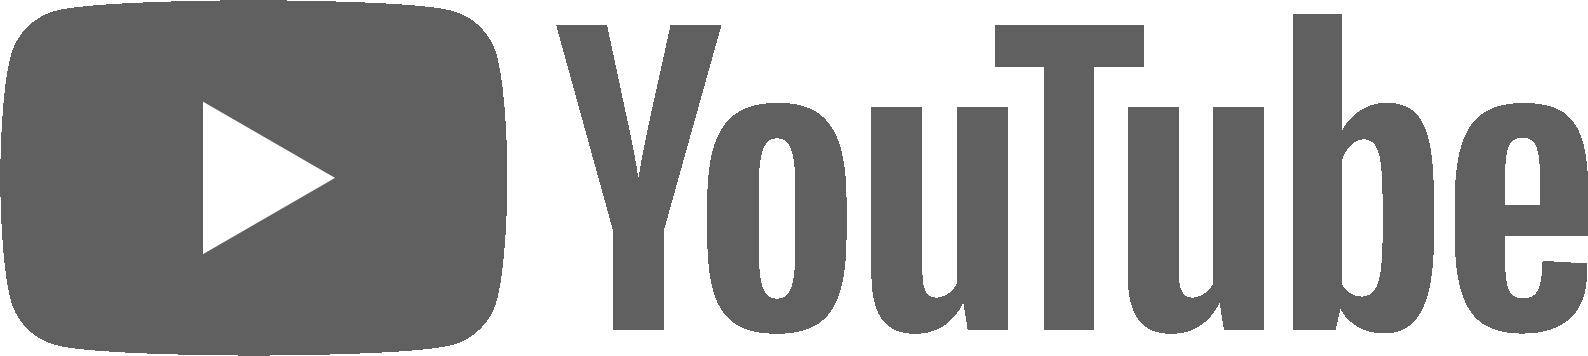 yt_logo_mono_light.png